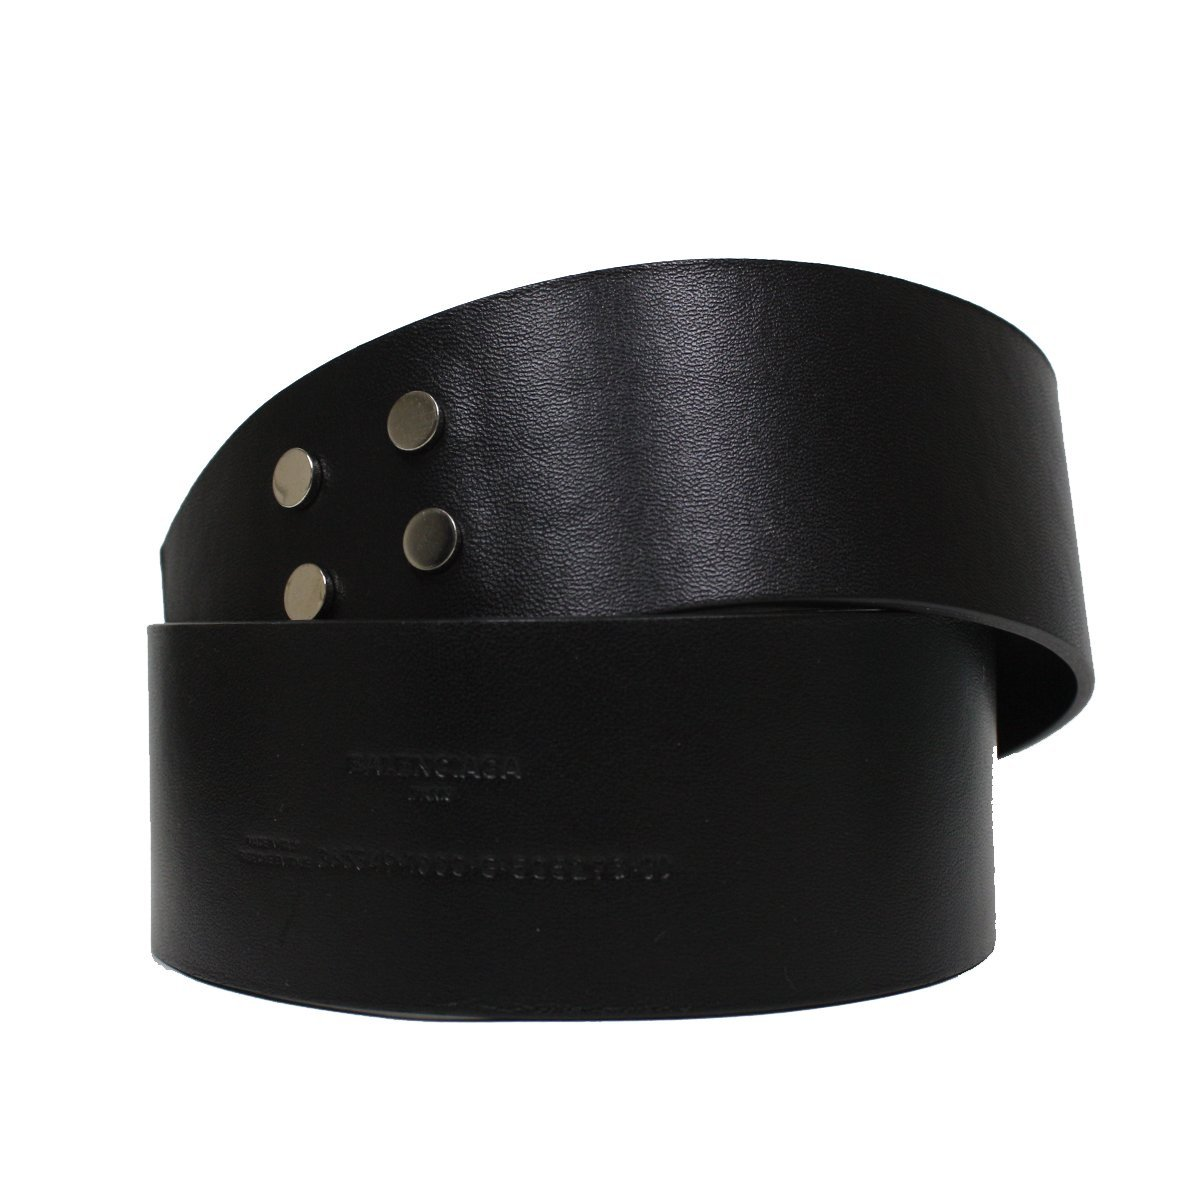 Balenciaga Couture Paris Wide Leather Waist Belt 365358 Size 80 cm / 32 in